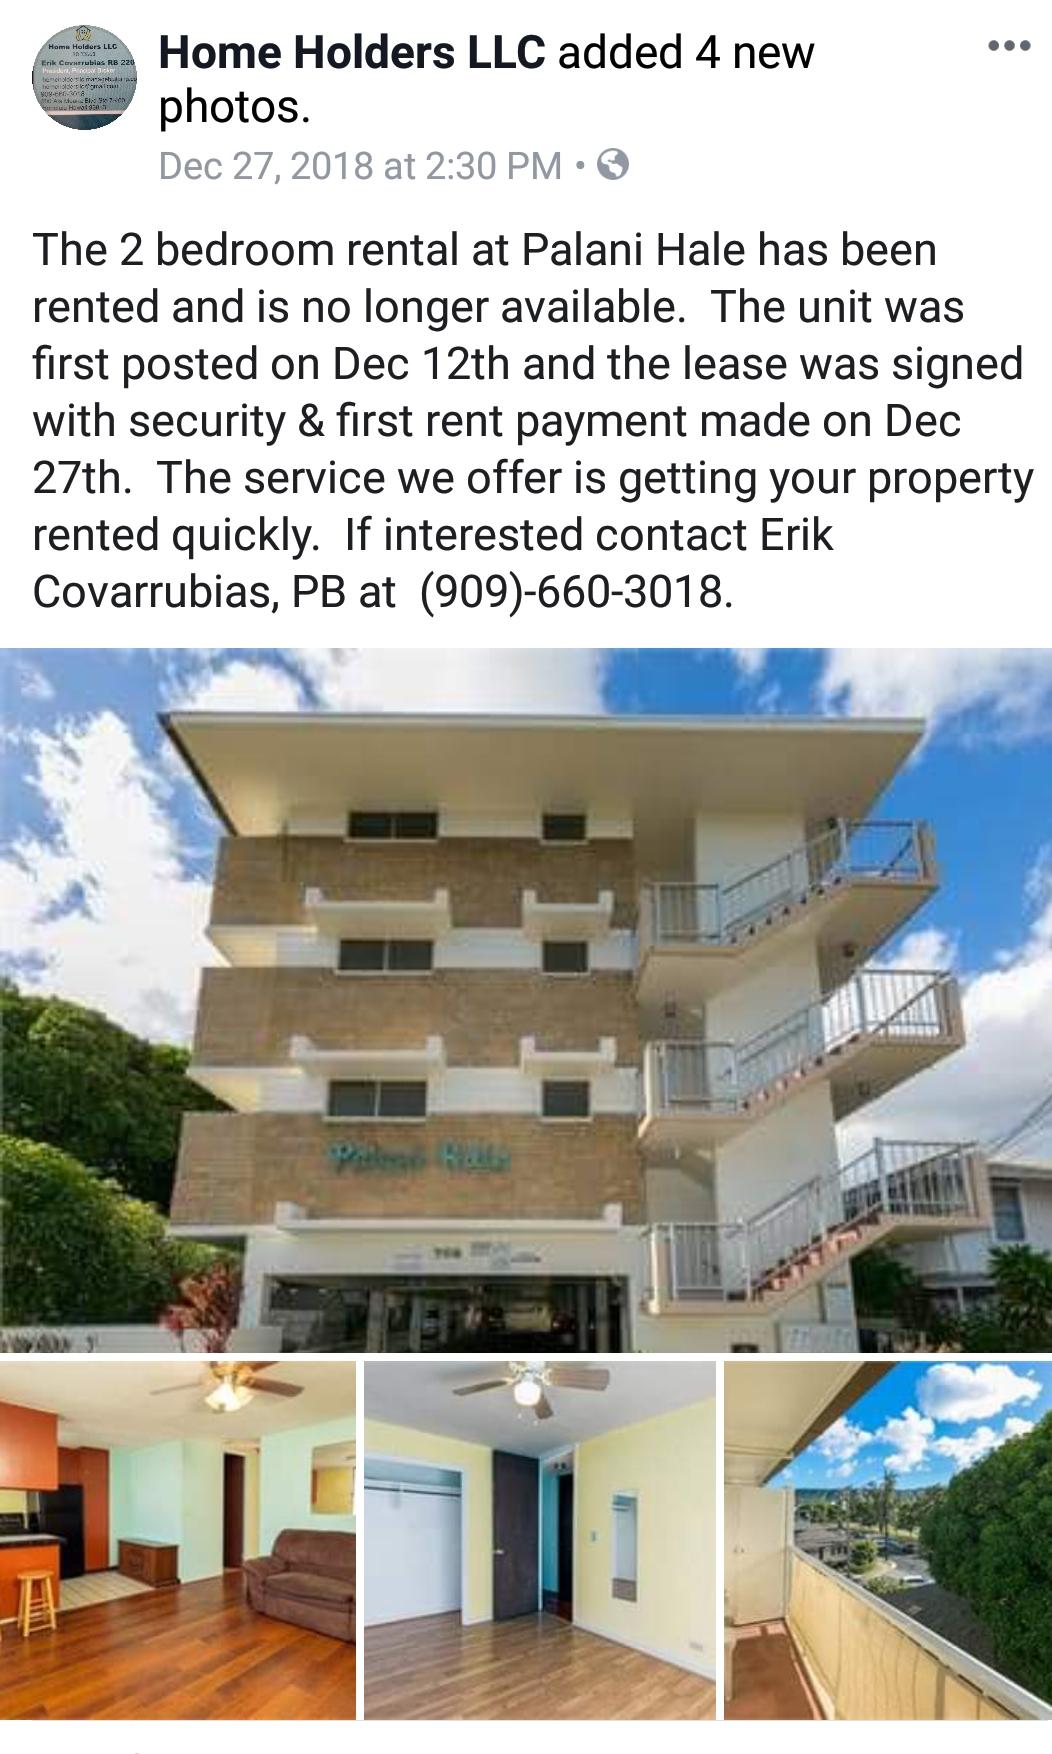 Home Holders LLC image 4